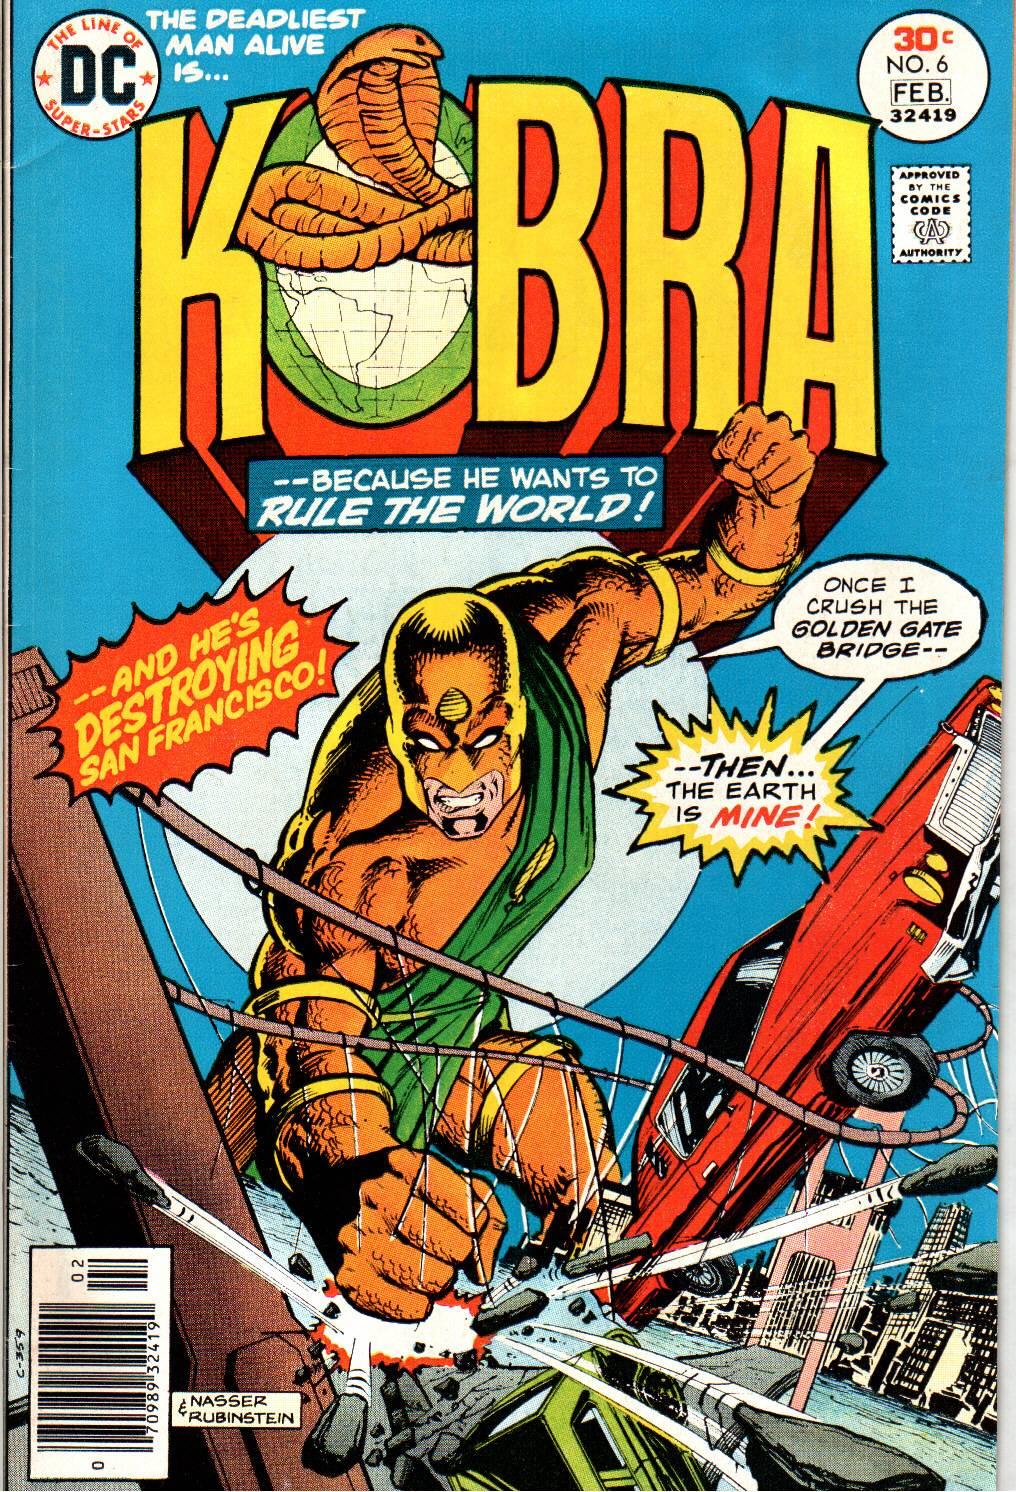 Kobra (1976) #6, cover penciled by Mike Nasser & inked by Joe Rubinstein.